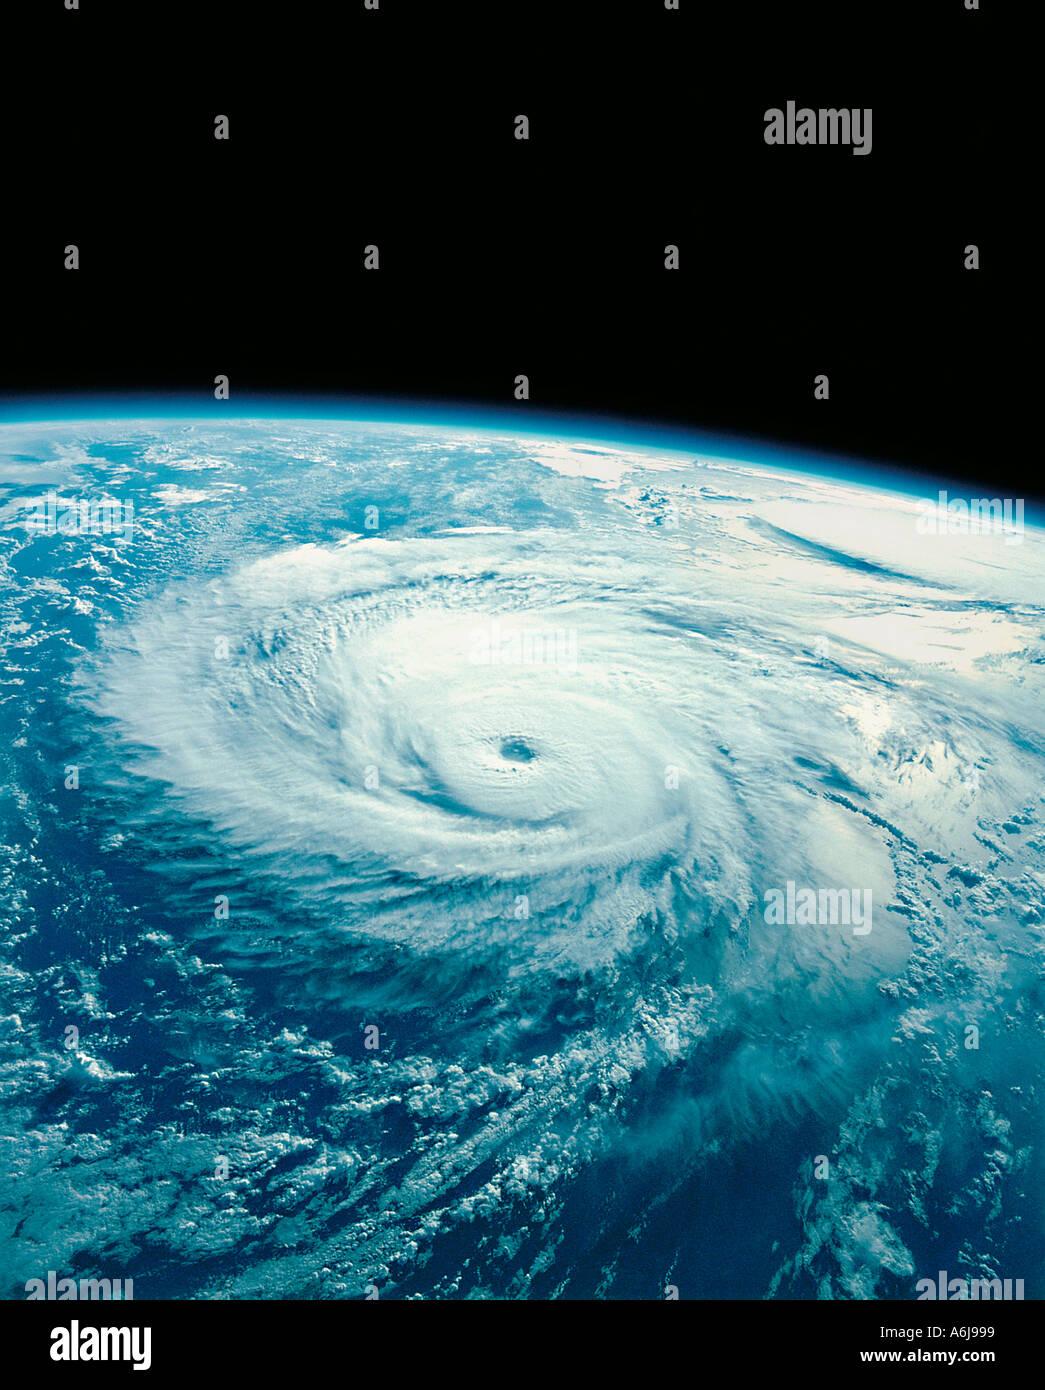 Hurricane aus dem Weltraum fotografiert Stockbild